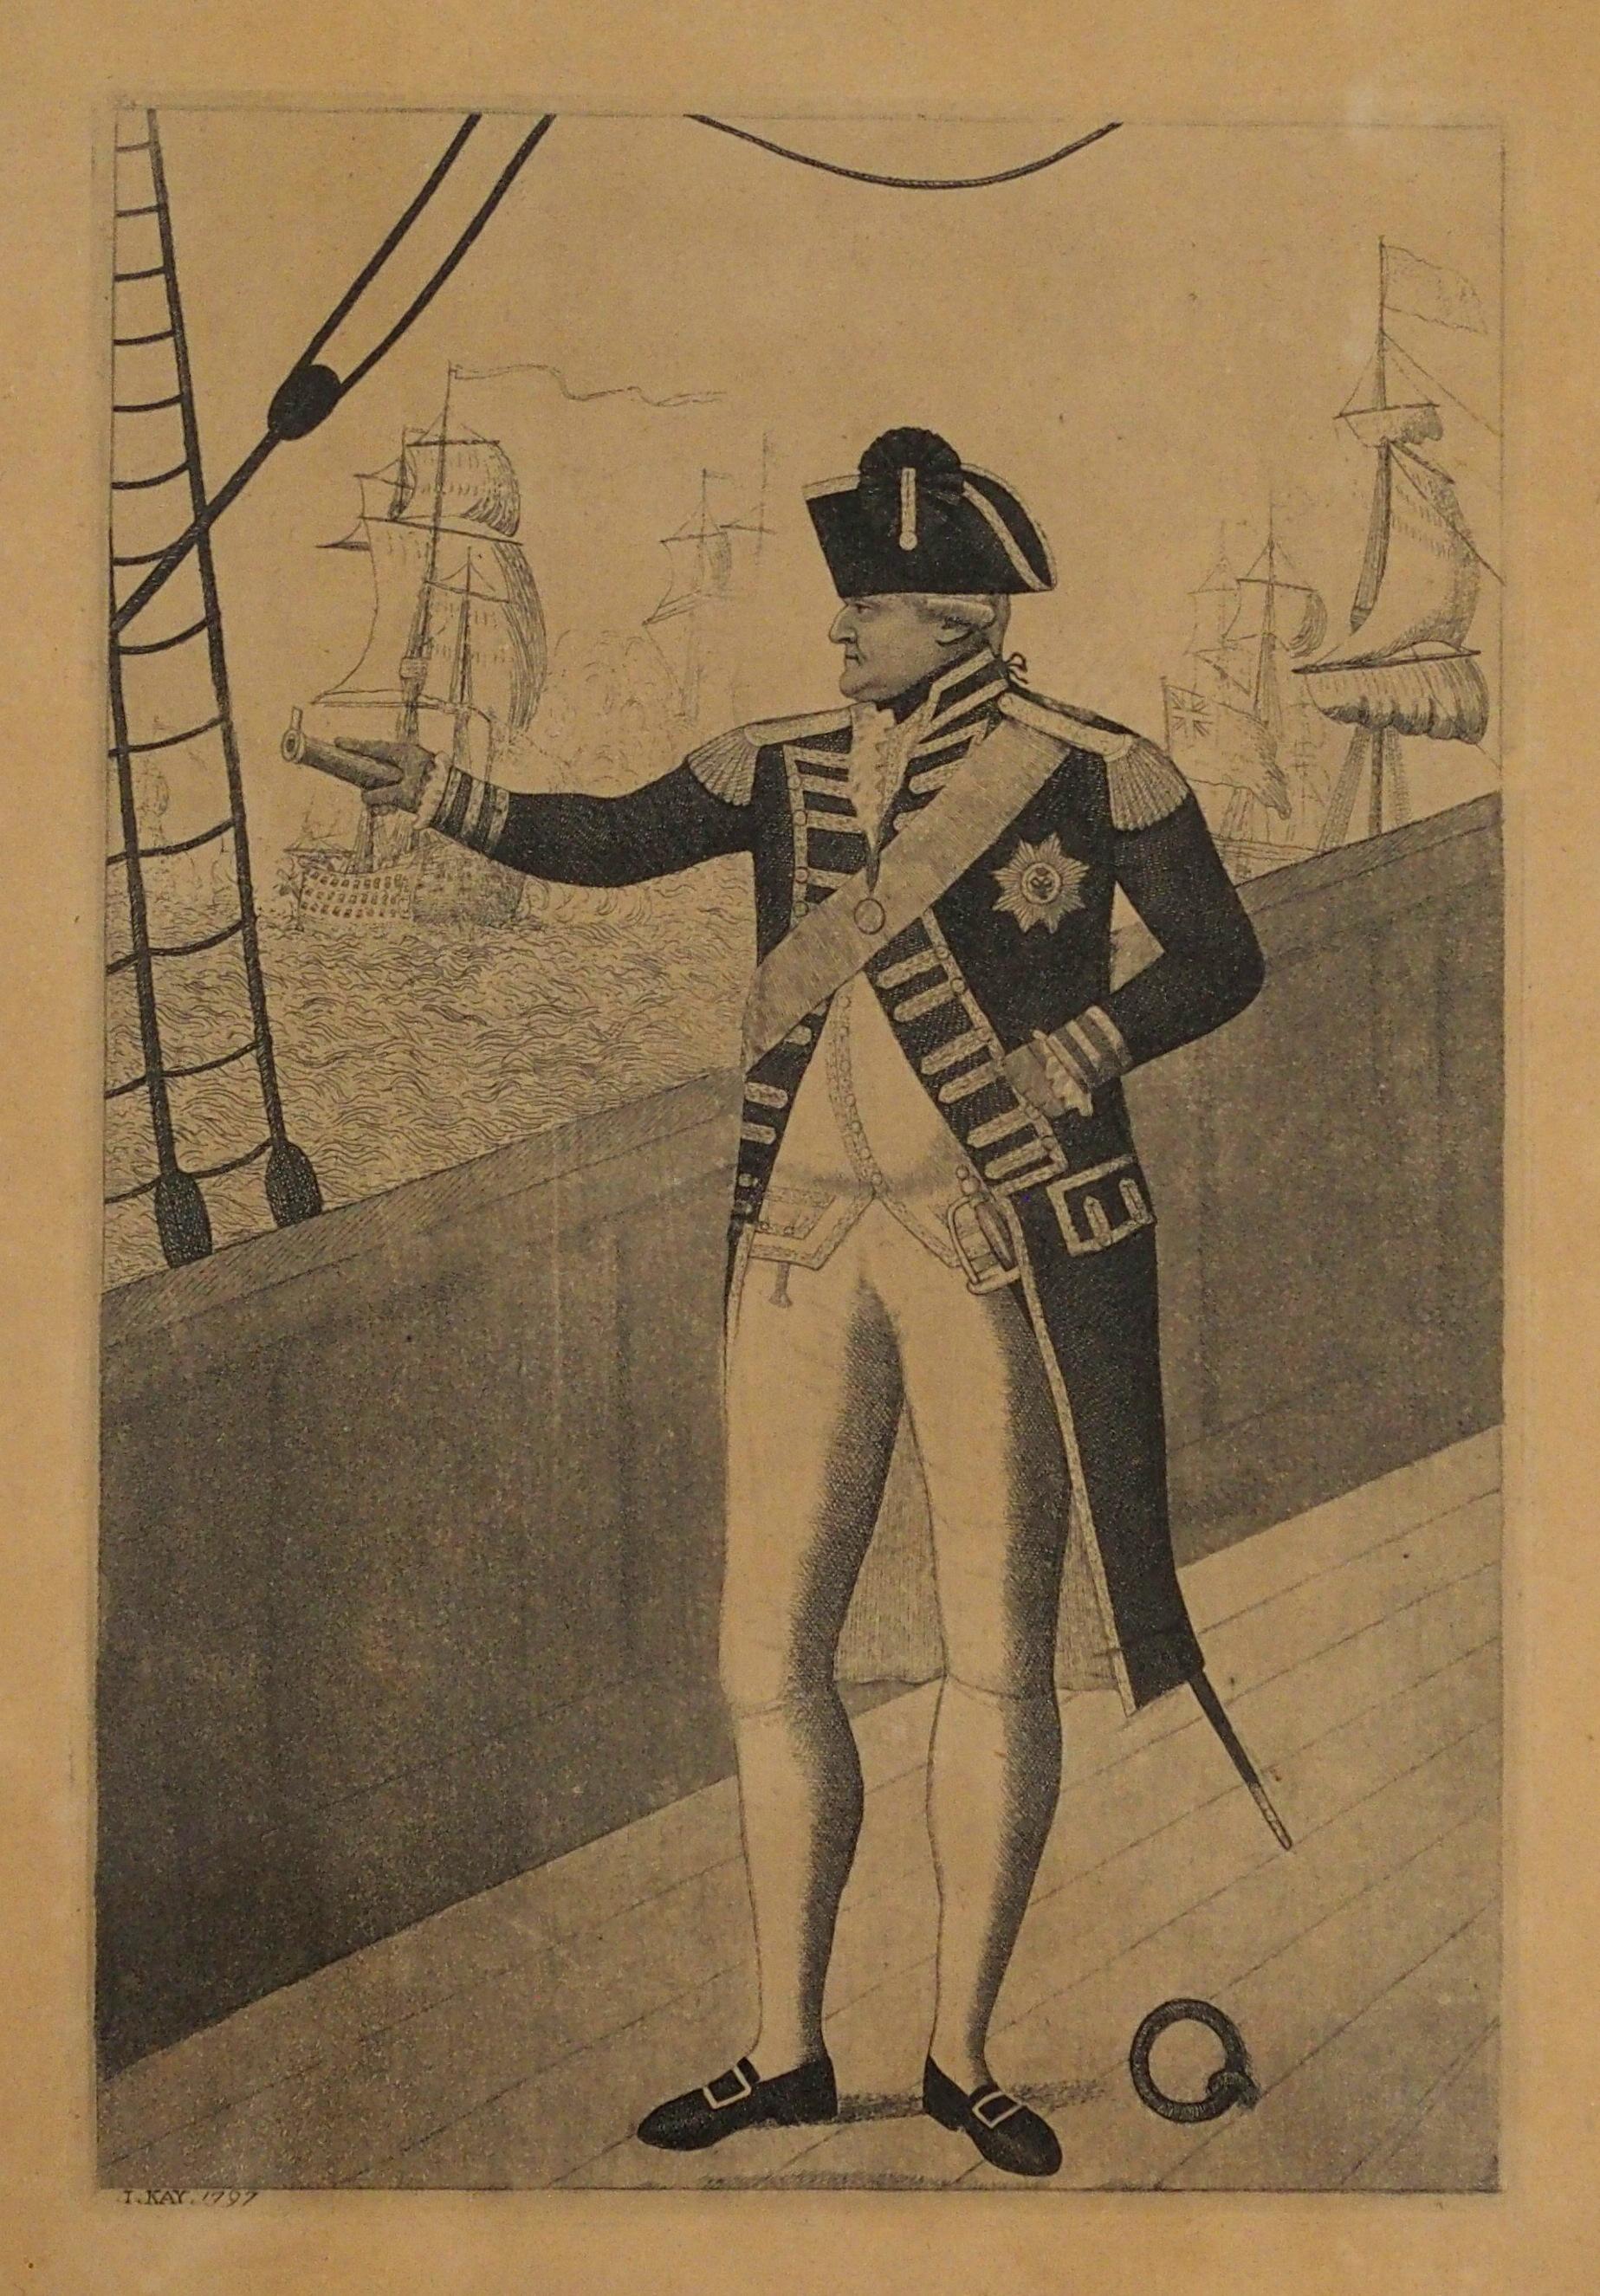 AFTER JOHN DUNCAN THE HEADLESS HORSEMAN engraving, 12 x 8cm, Admiral Viscount Duncan print, three - Image 3 of 12